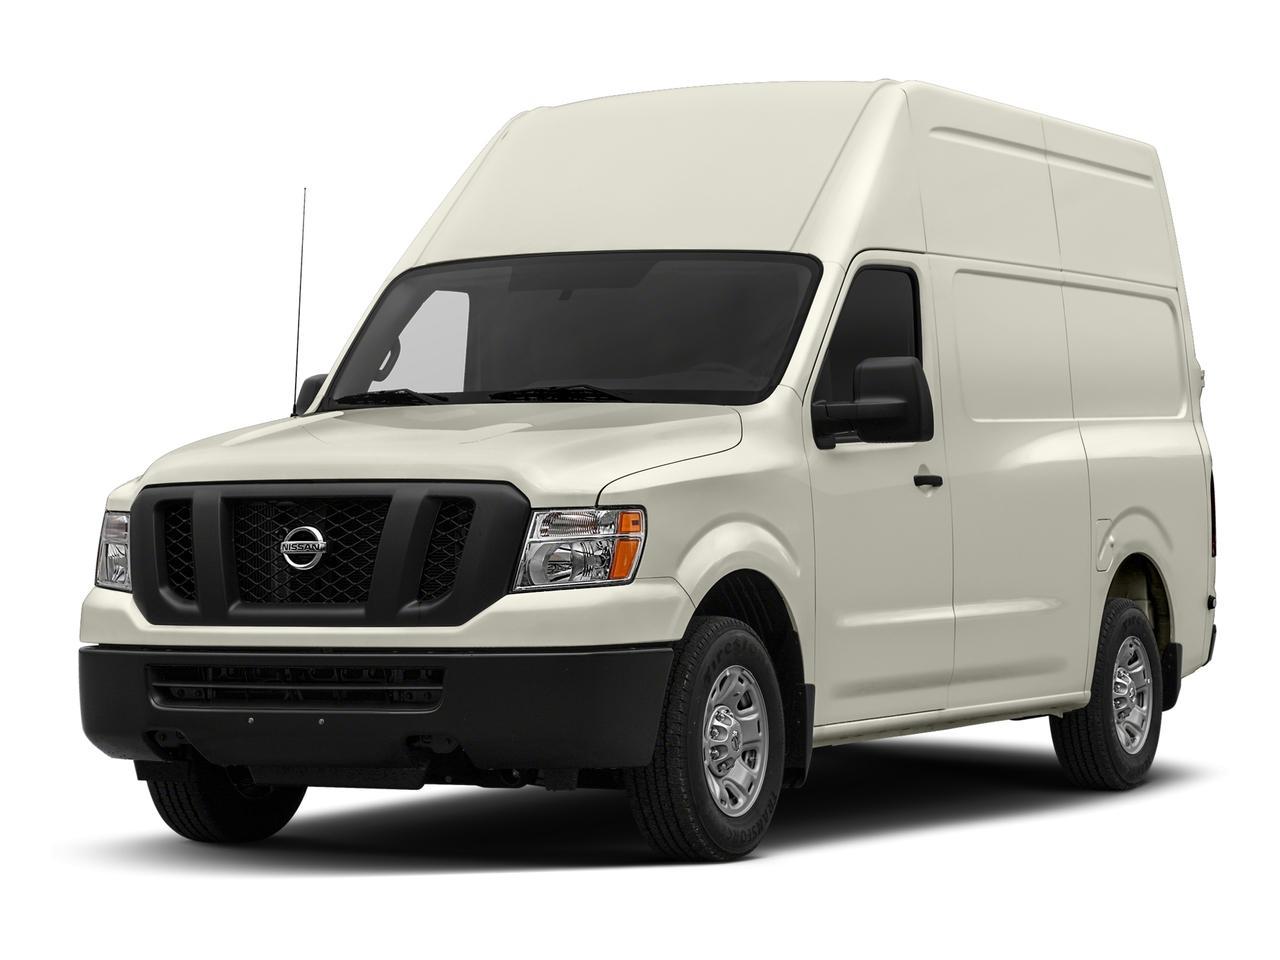 2017 Nissan NV Cargo Vehicle Photo in Doylestown, PA 18901